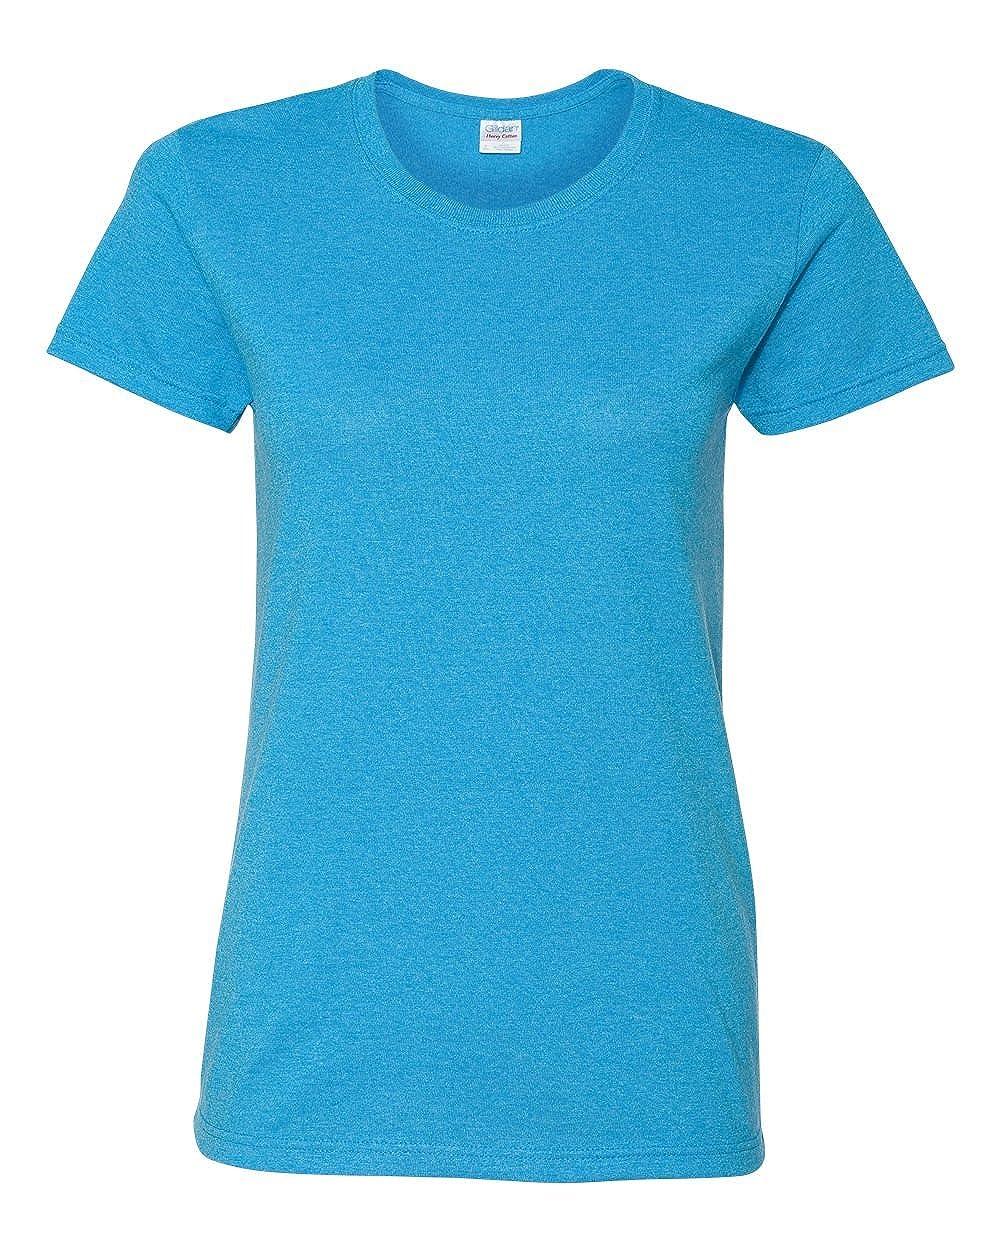 Heather Sapphire Gildan Womens 5.3 oz. Heavy Cotton Missy Fit TShirt G500L (Pack of 12)